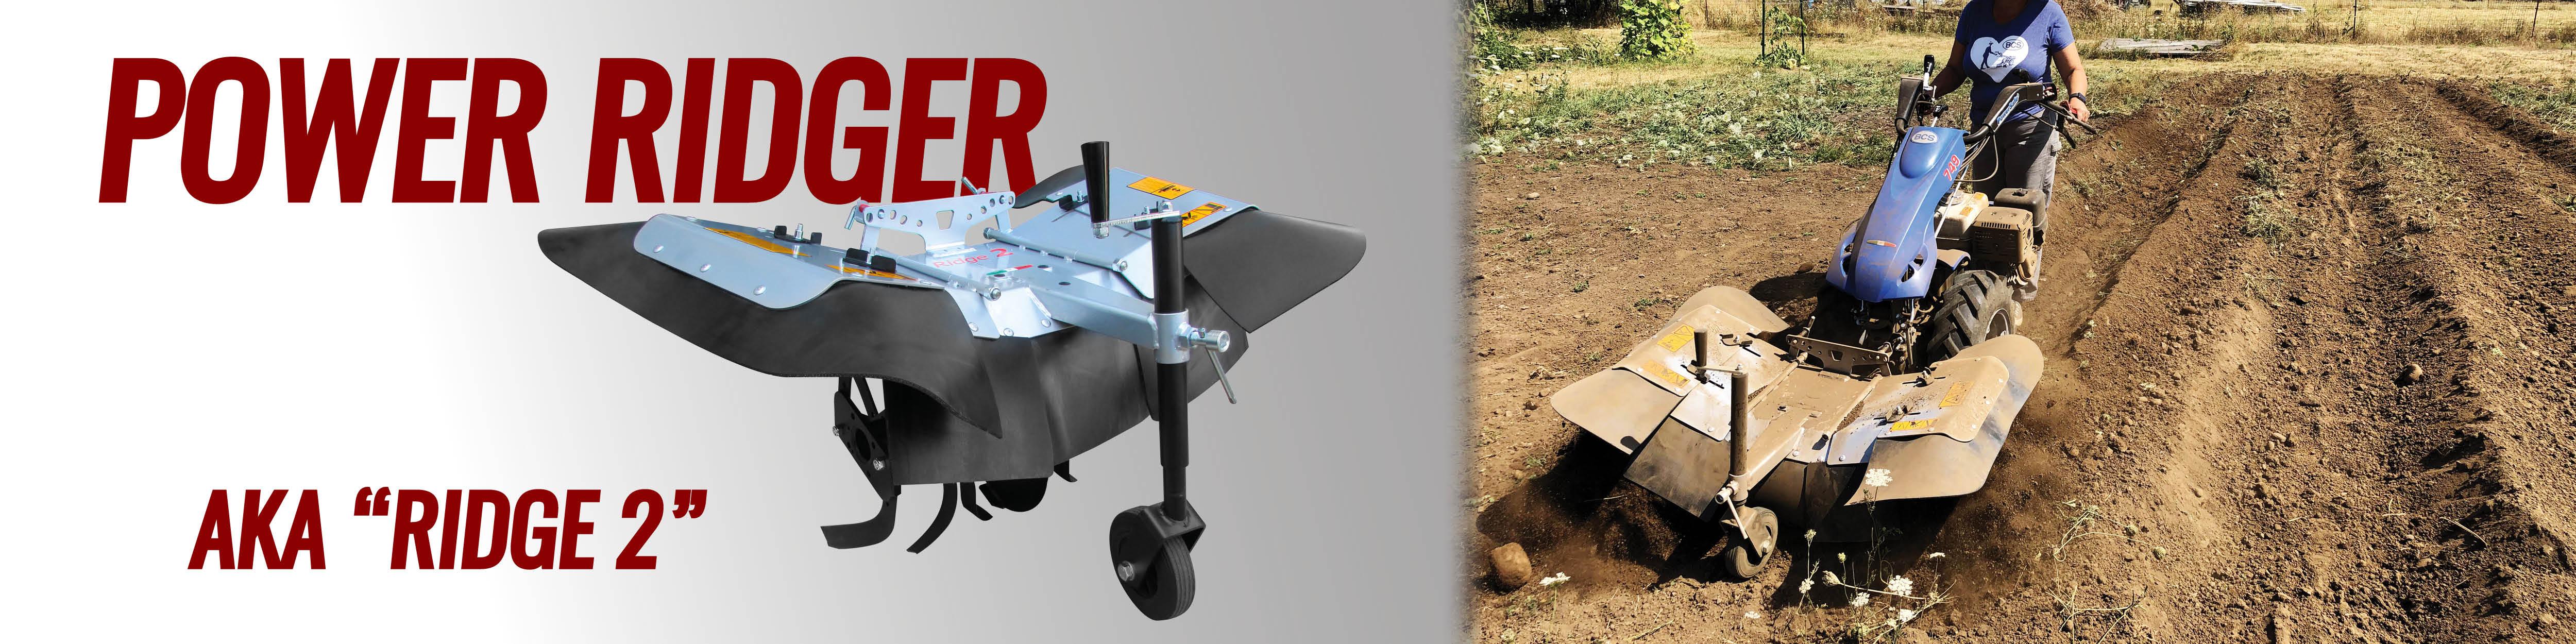 Introducing the Power Ridger